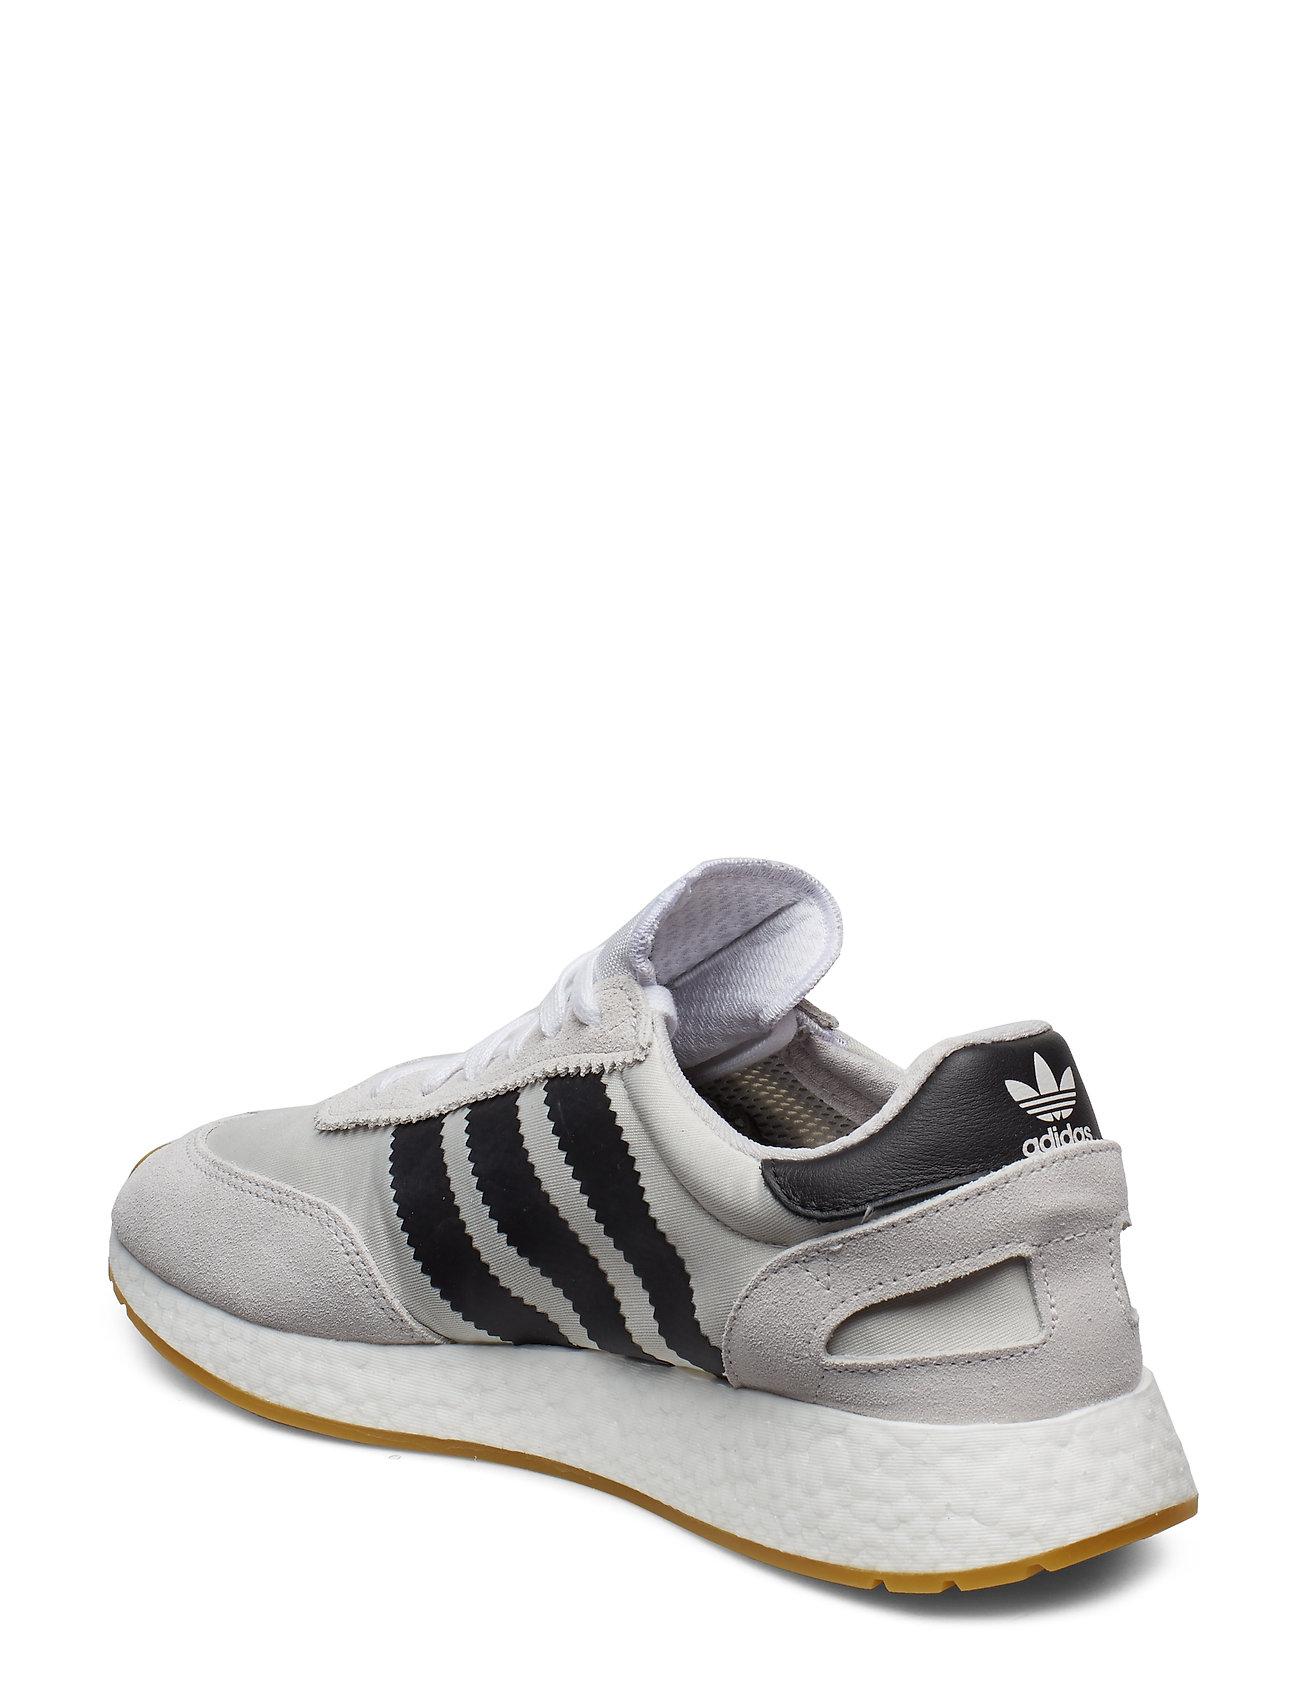 Niedrige Sneaker I 5923 Buntgemustert 30Sale ADIDAS tsQrxhCdB